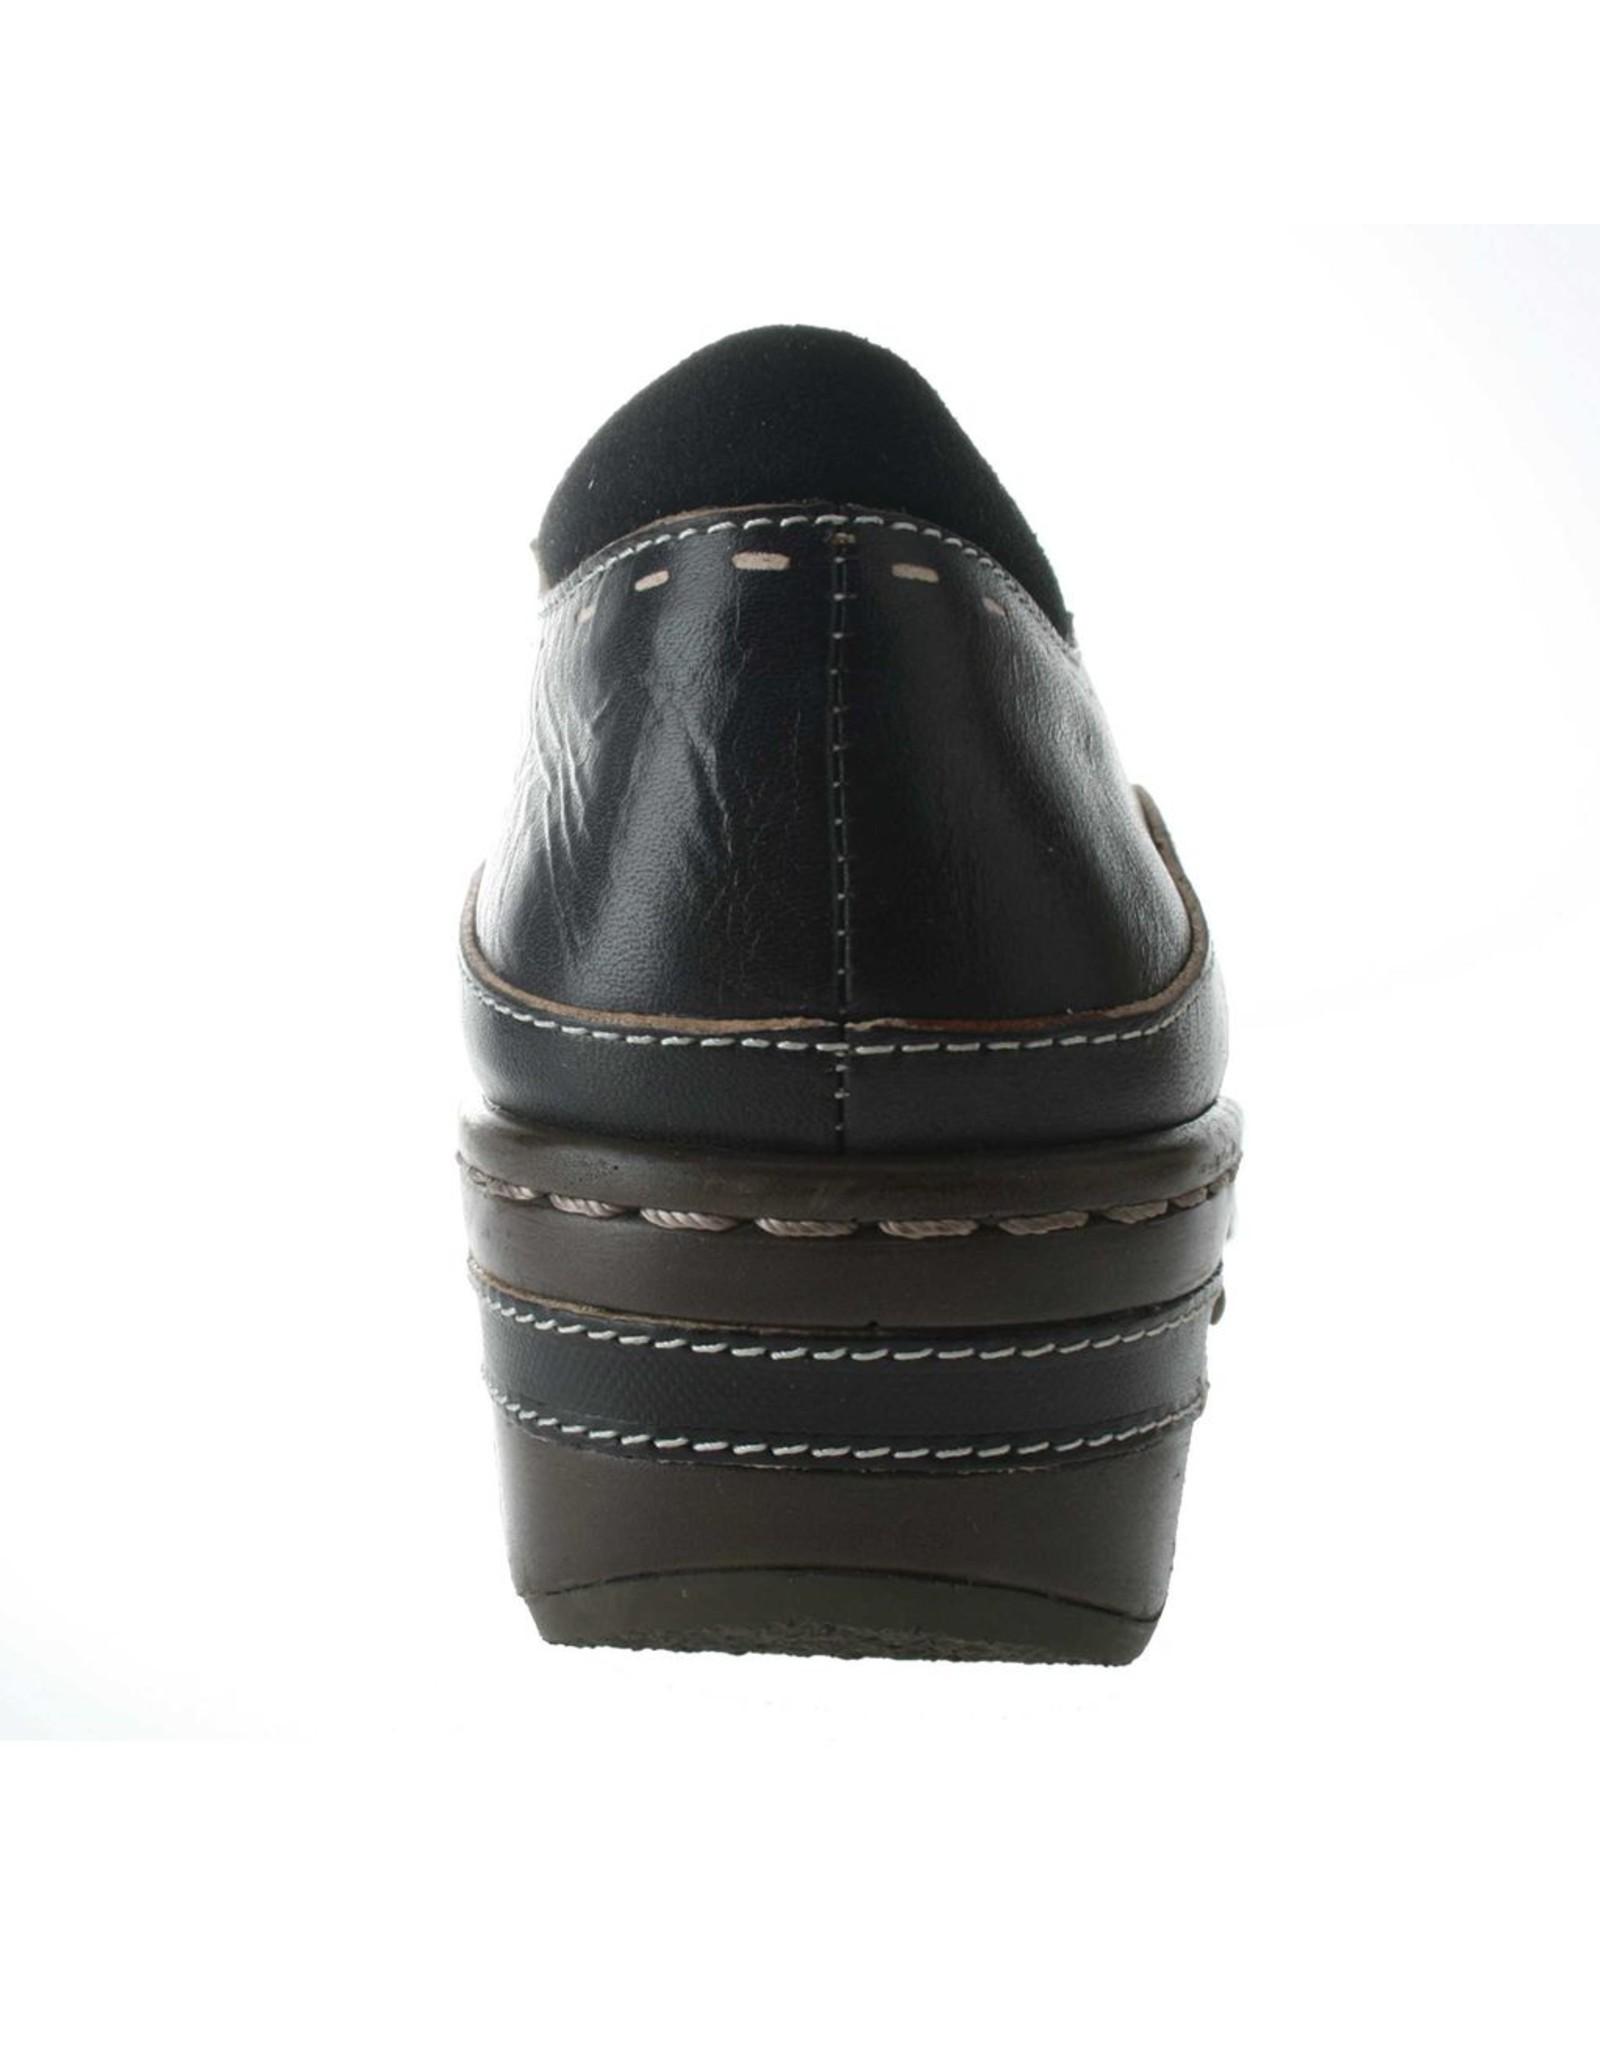 Burbank Black Leather Clog